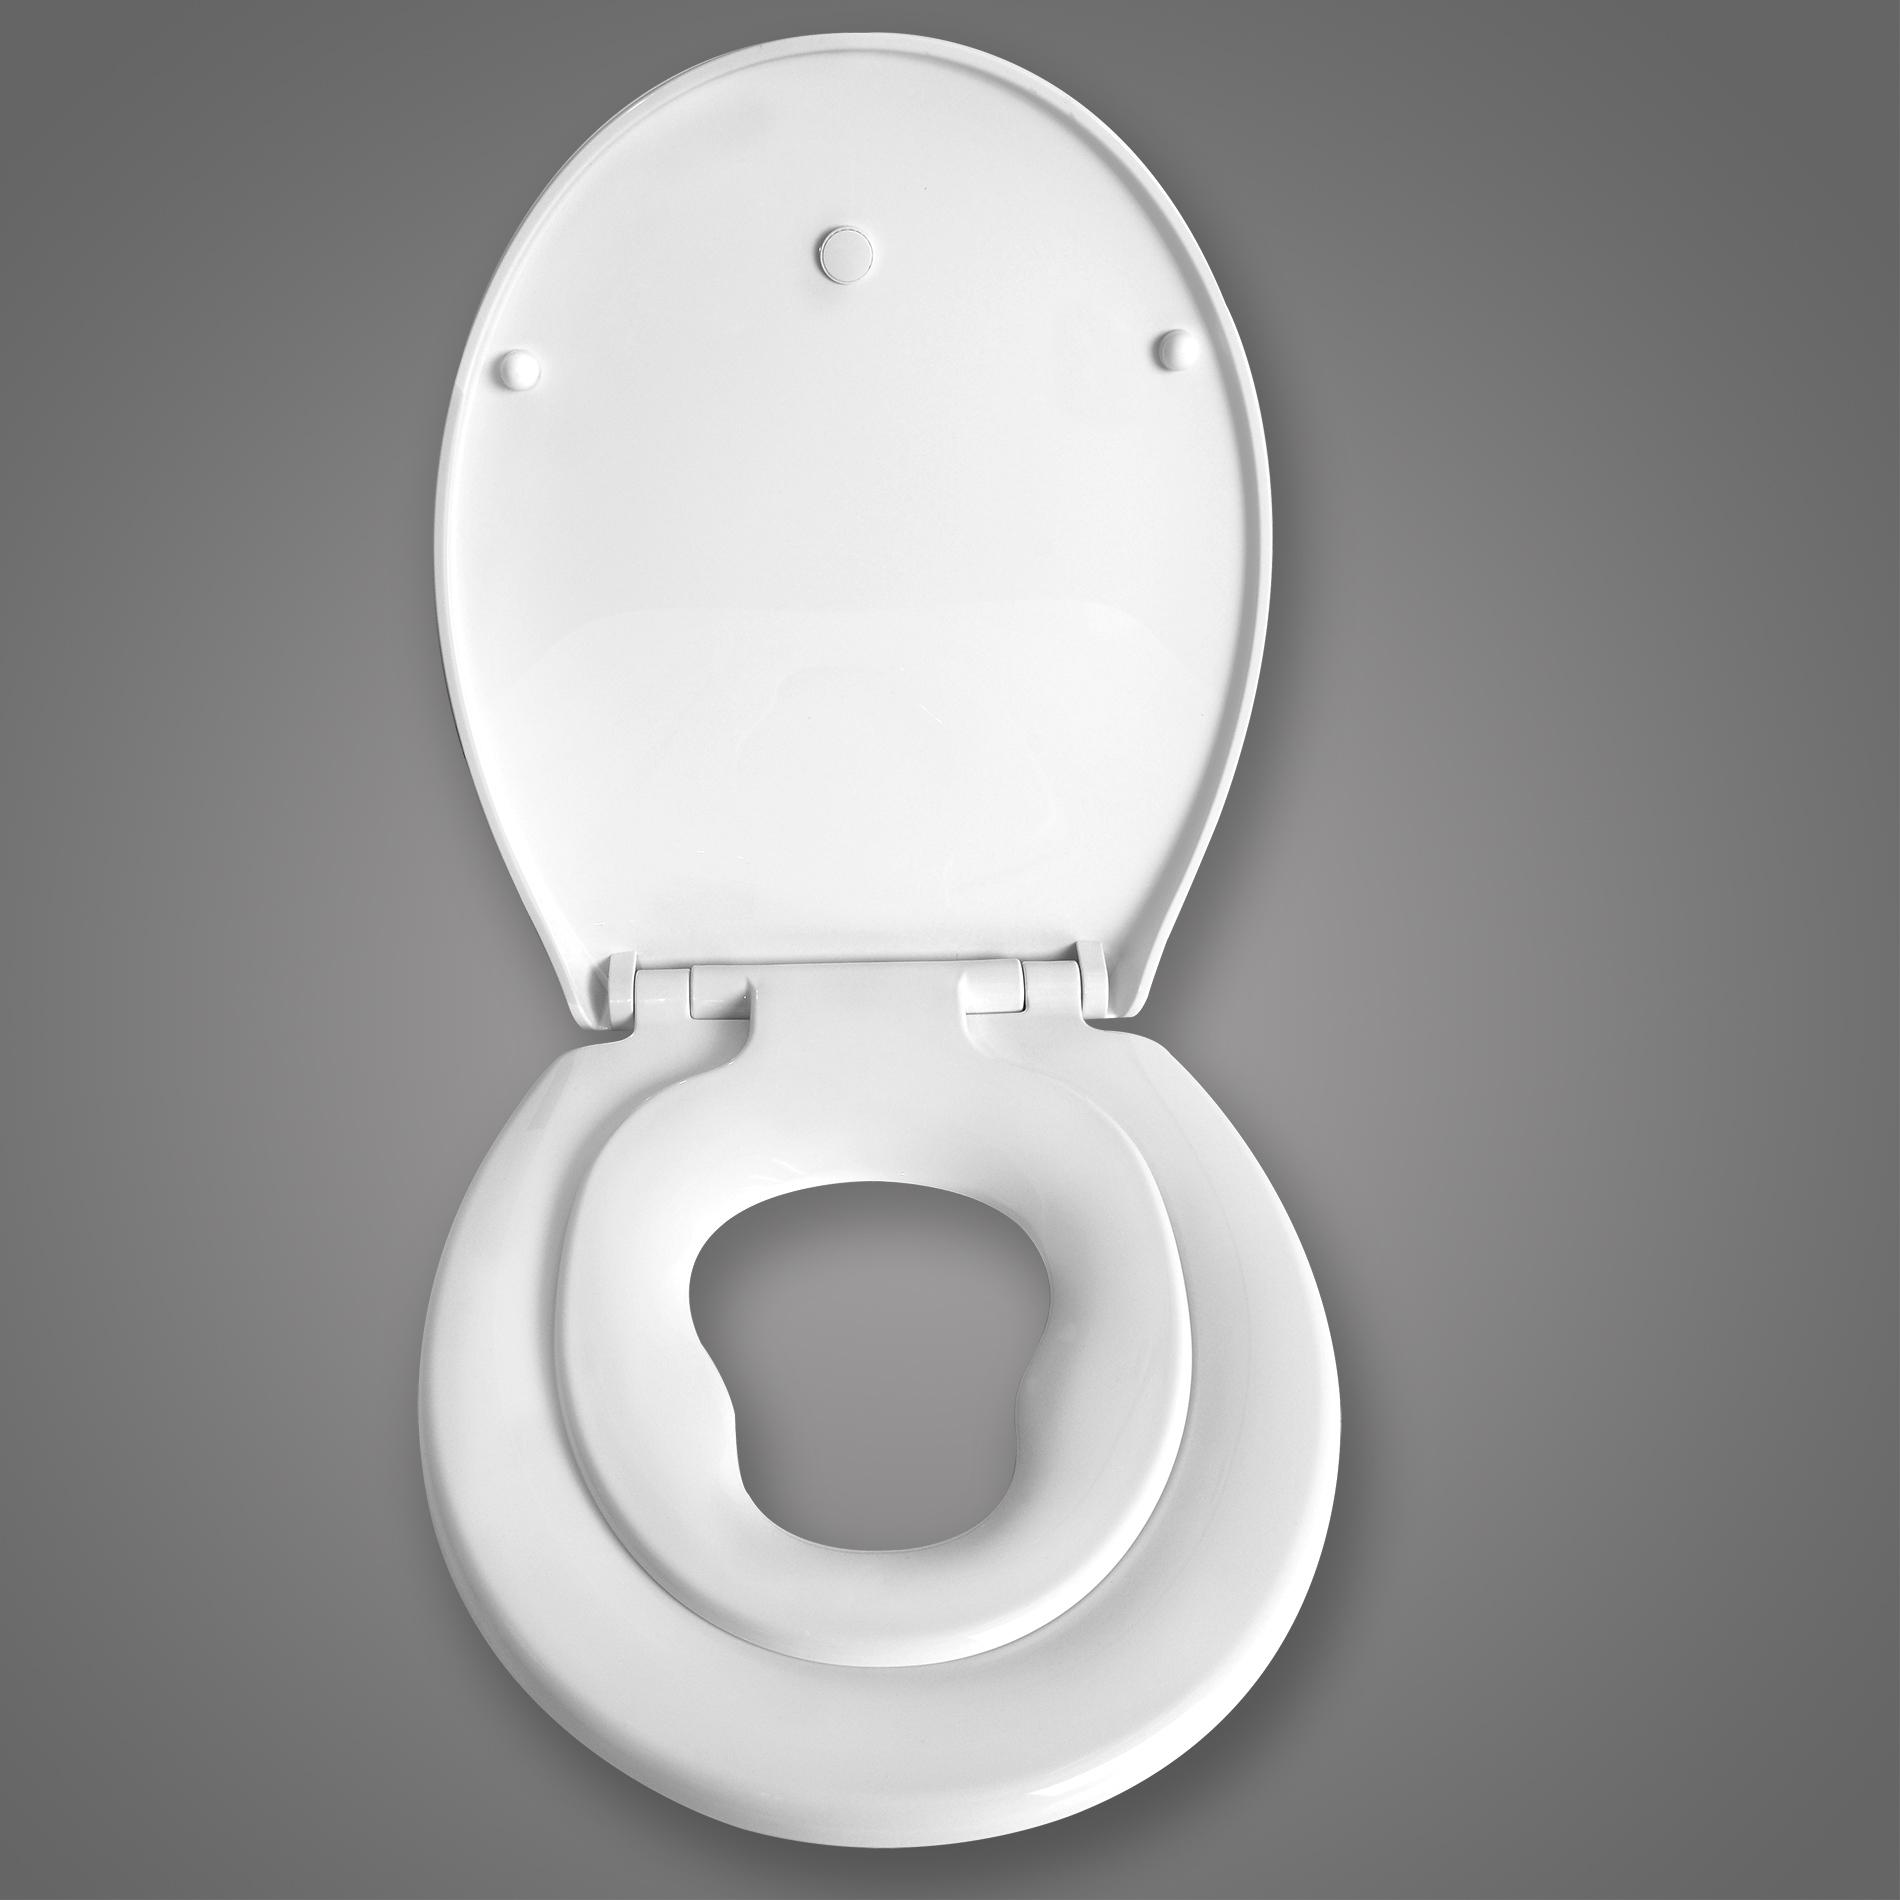 toilettensitz wc sitz toilettendeckel mit kindersitz absenkautomatik neu ws2601 ebay. Black Bedroom Furniture Sets. Home Design Ideas